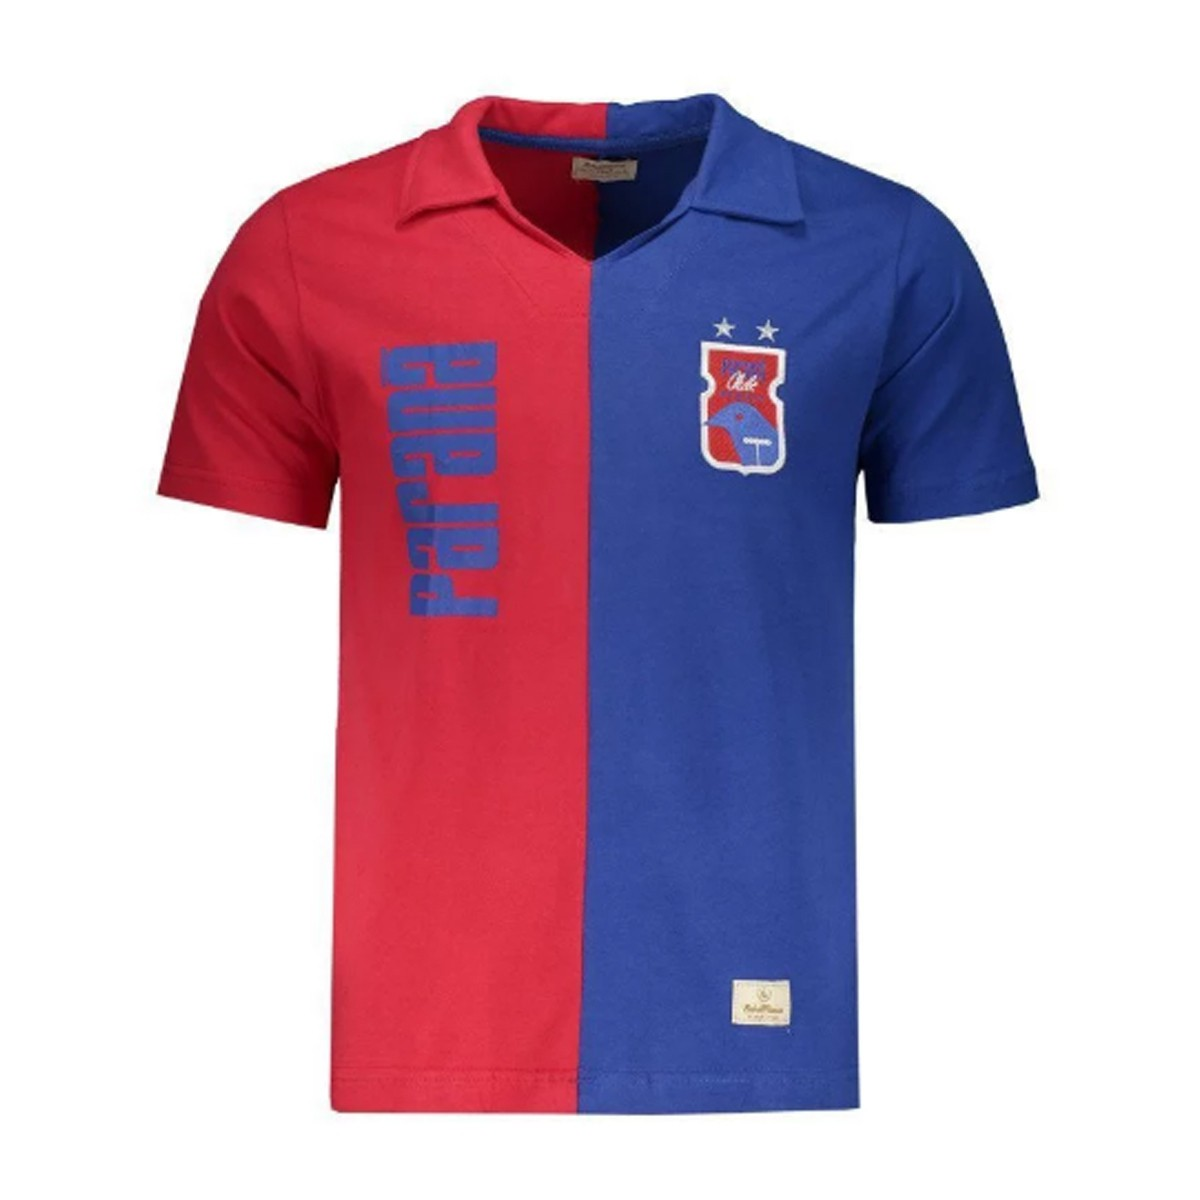 Camisa Paraná Retrômania Clube 1990 - Retrô